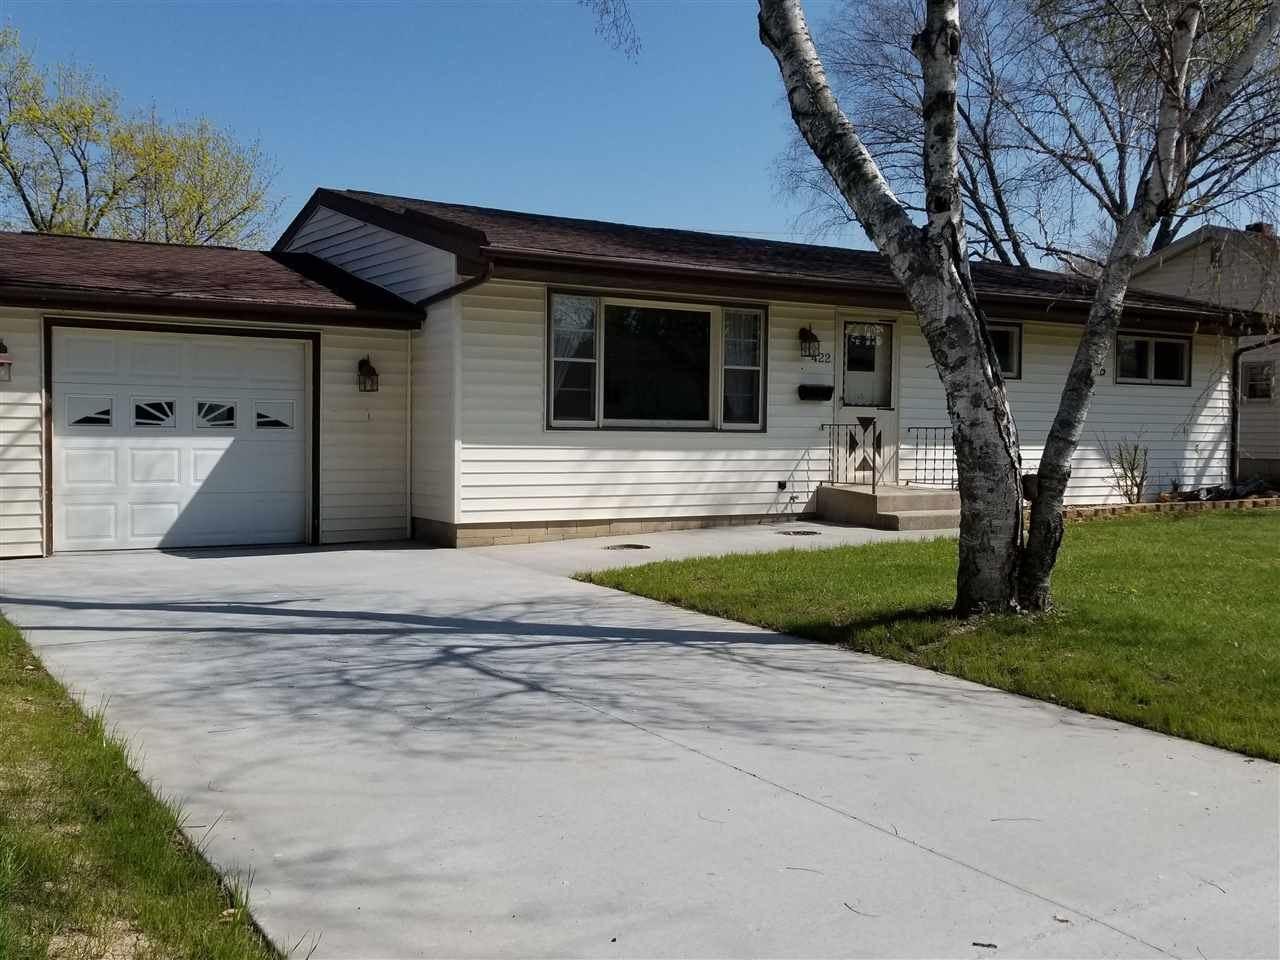 422 Hemphill Ave, Edgerton, WI 53534 - #: 1907199